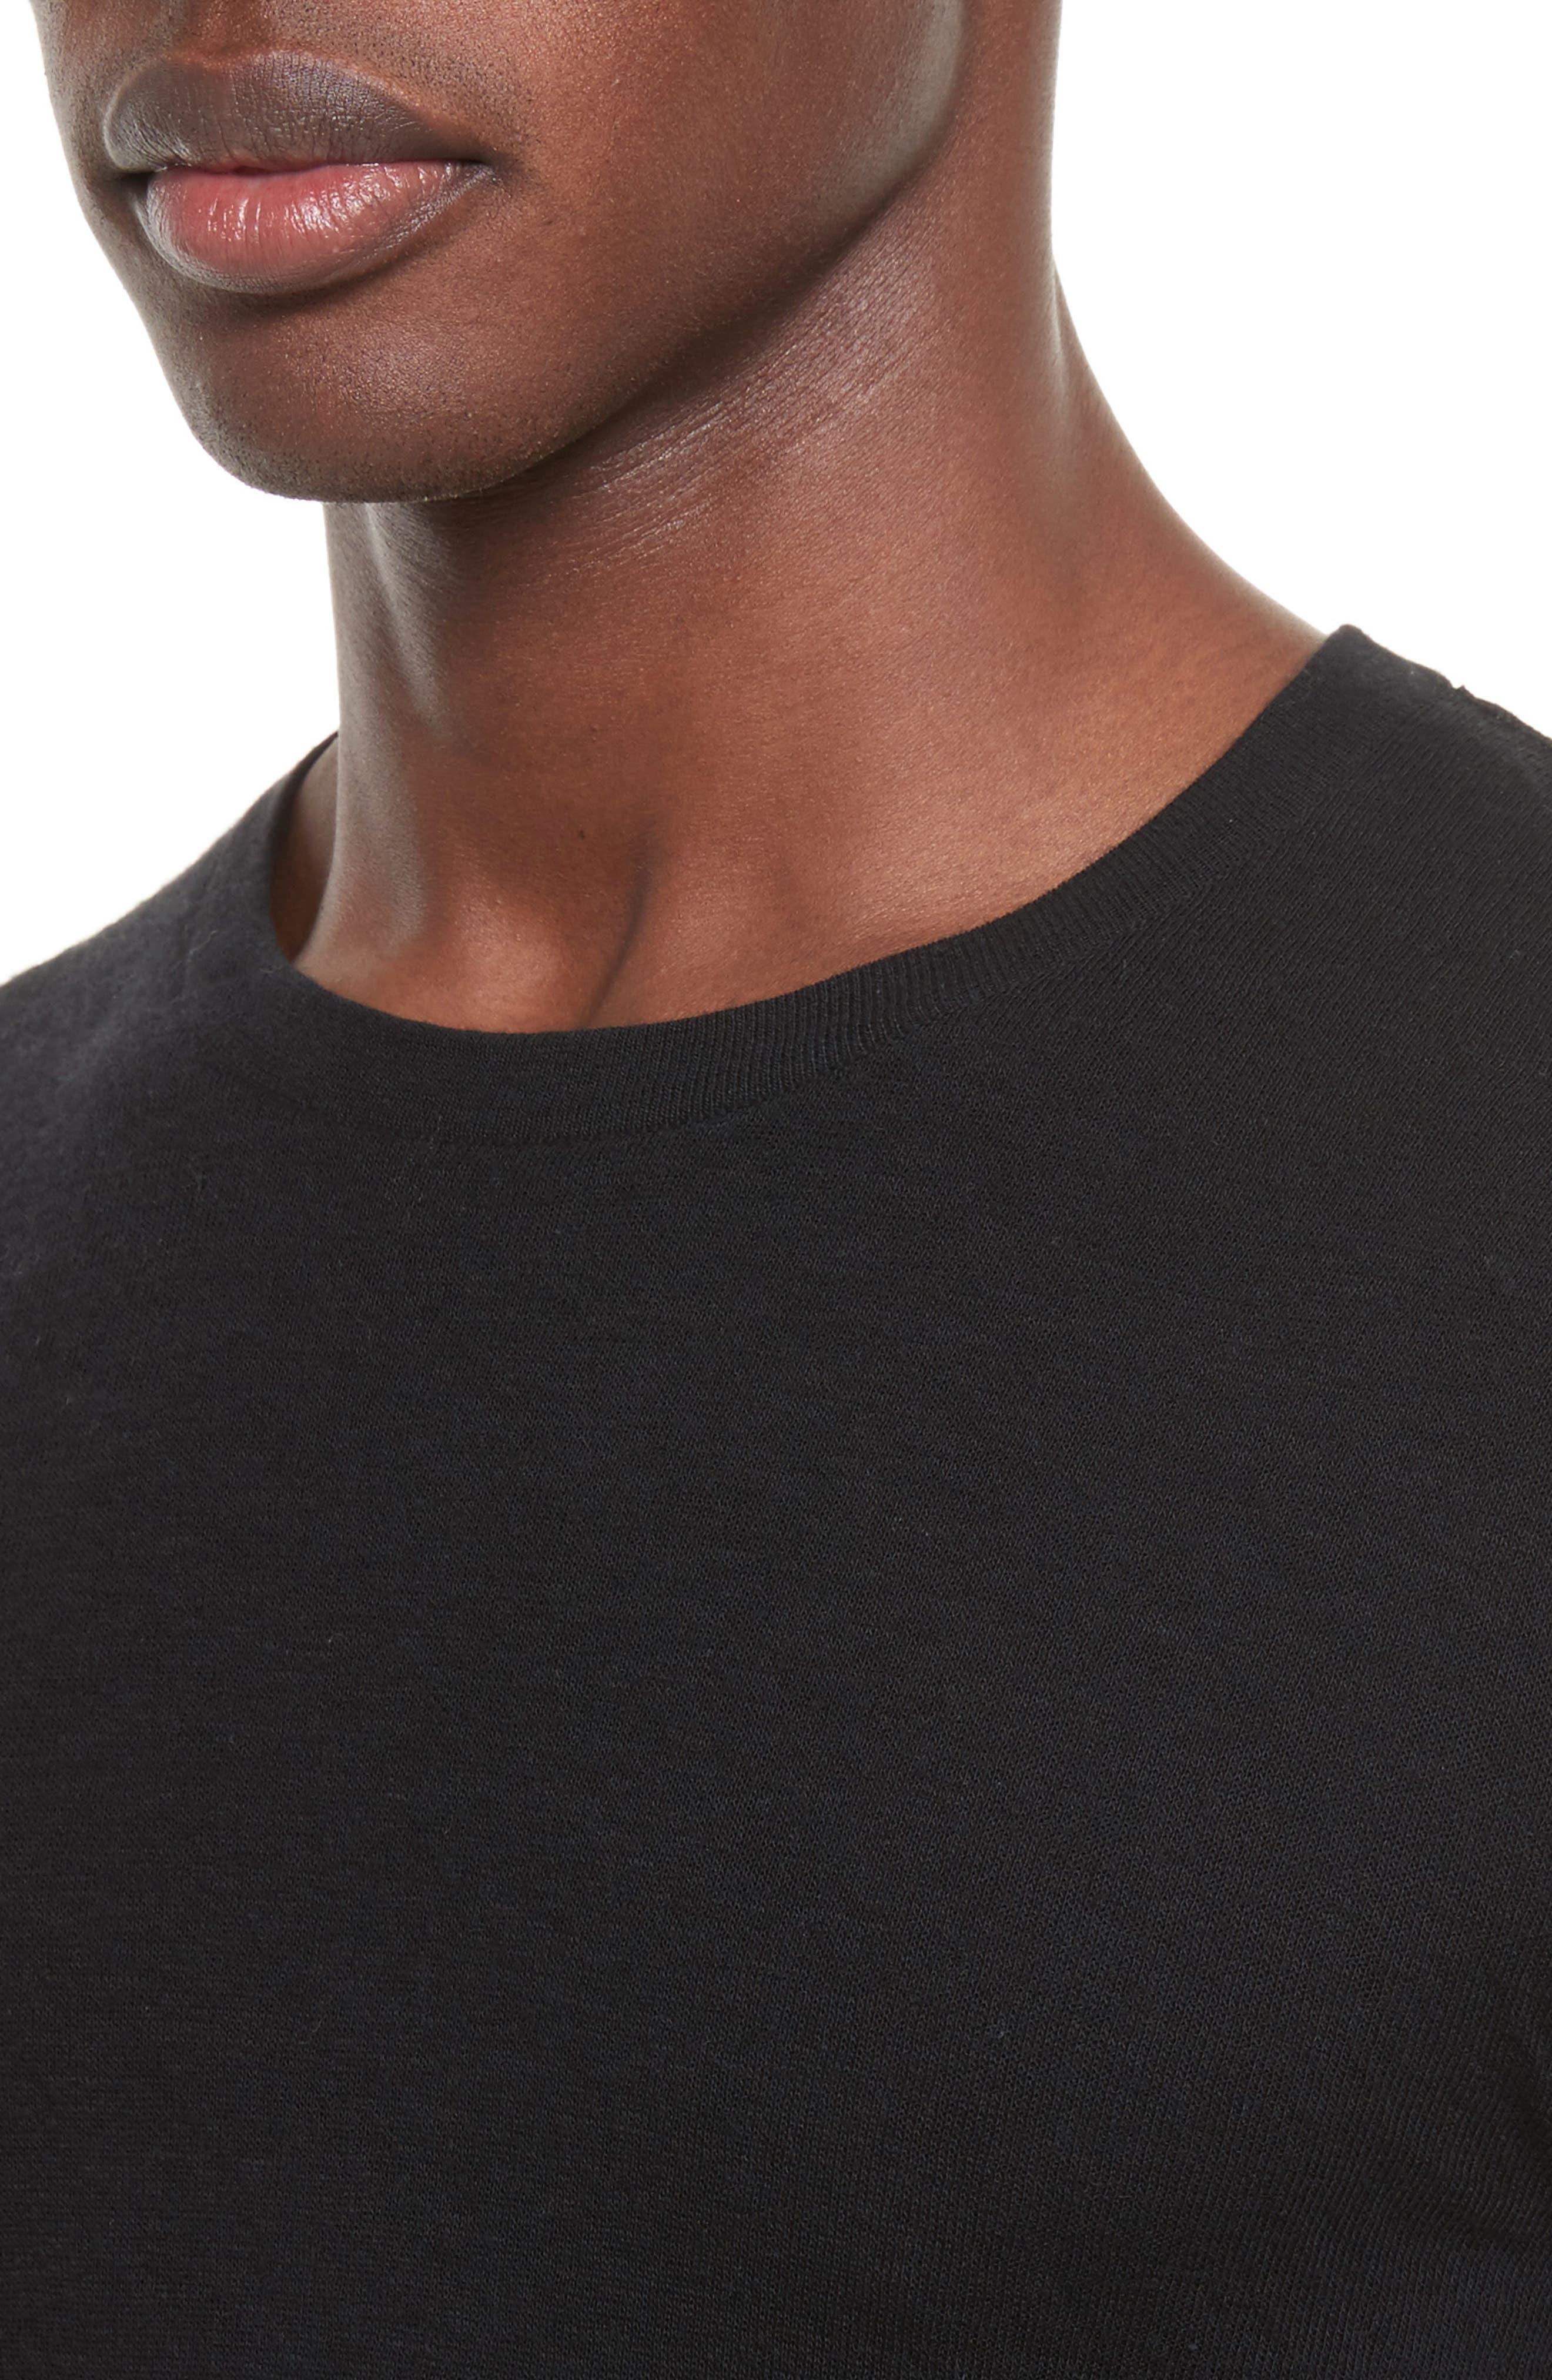 Tripp Crewneck Sweater,                             Alternate thumbnail 4, color,                             Black